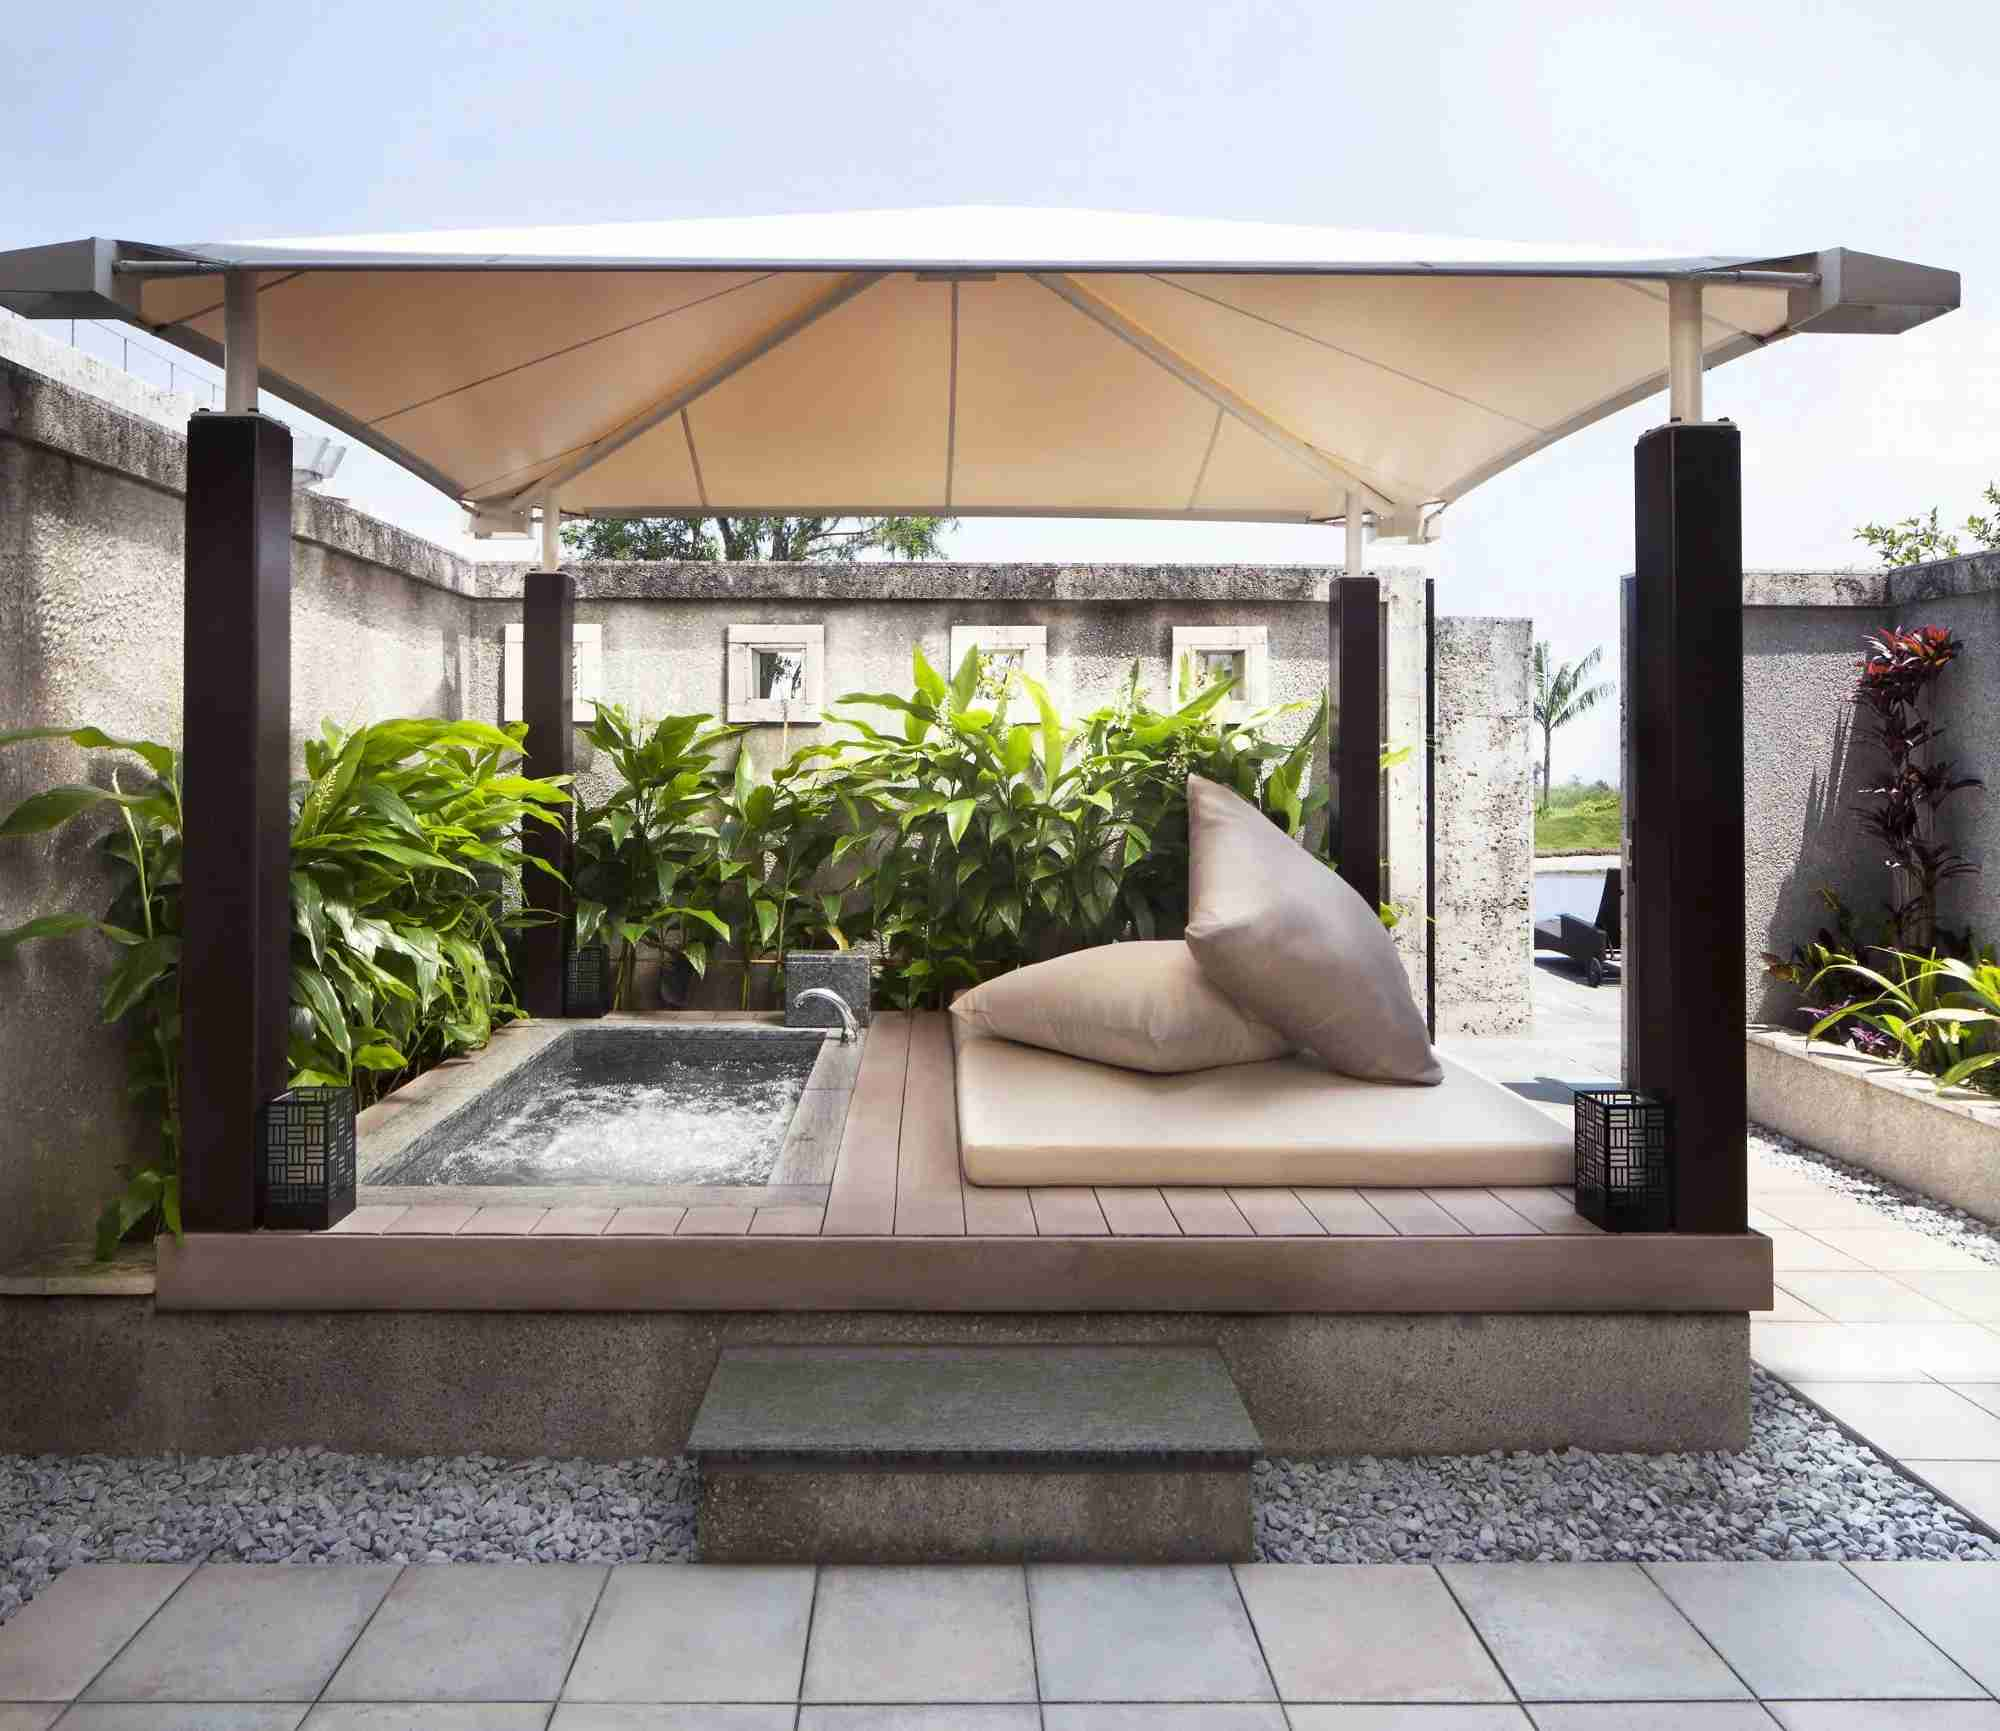 Image courtesy of The Ritz-Calrton Okinawa.